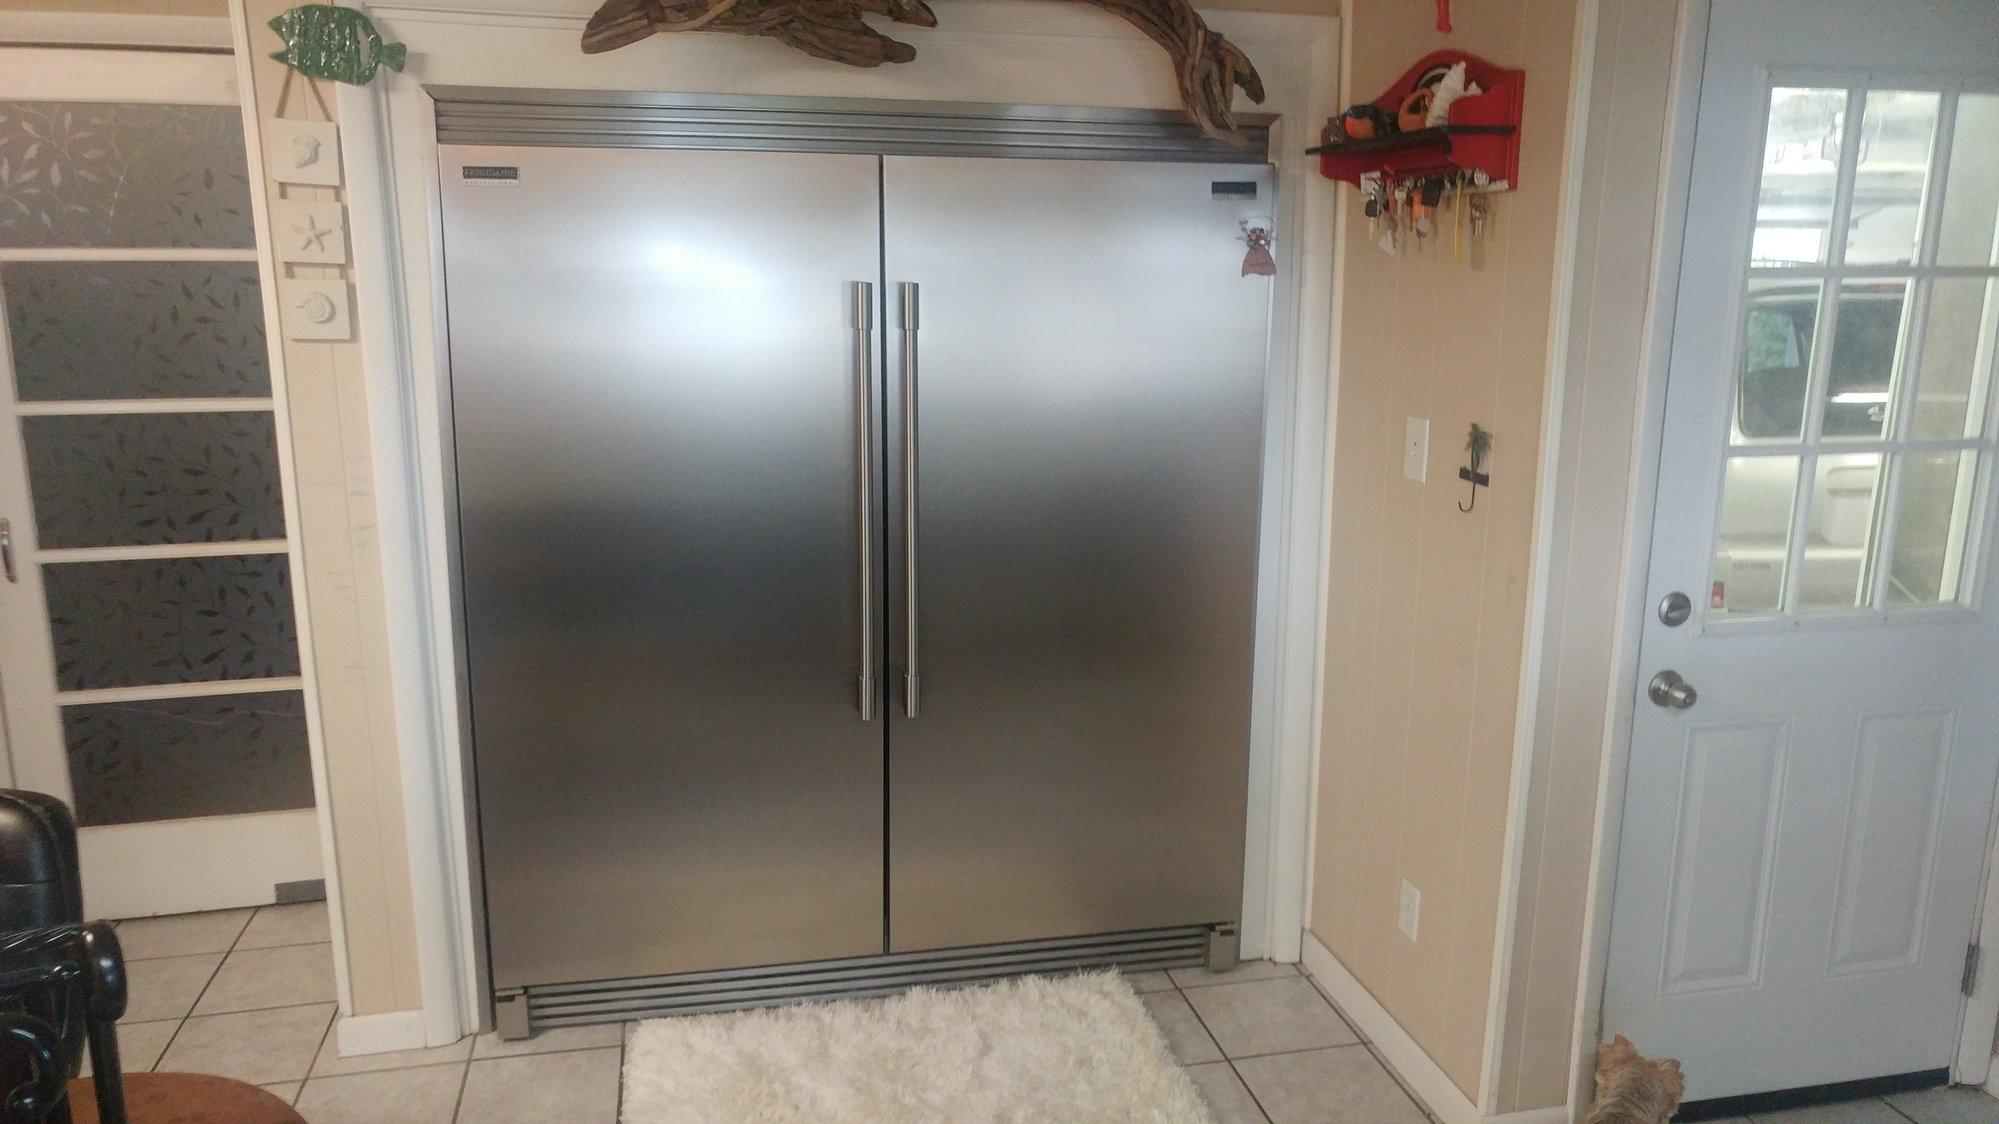 Frigidaire Side By Side Refrigerator Freezer Doors